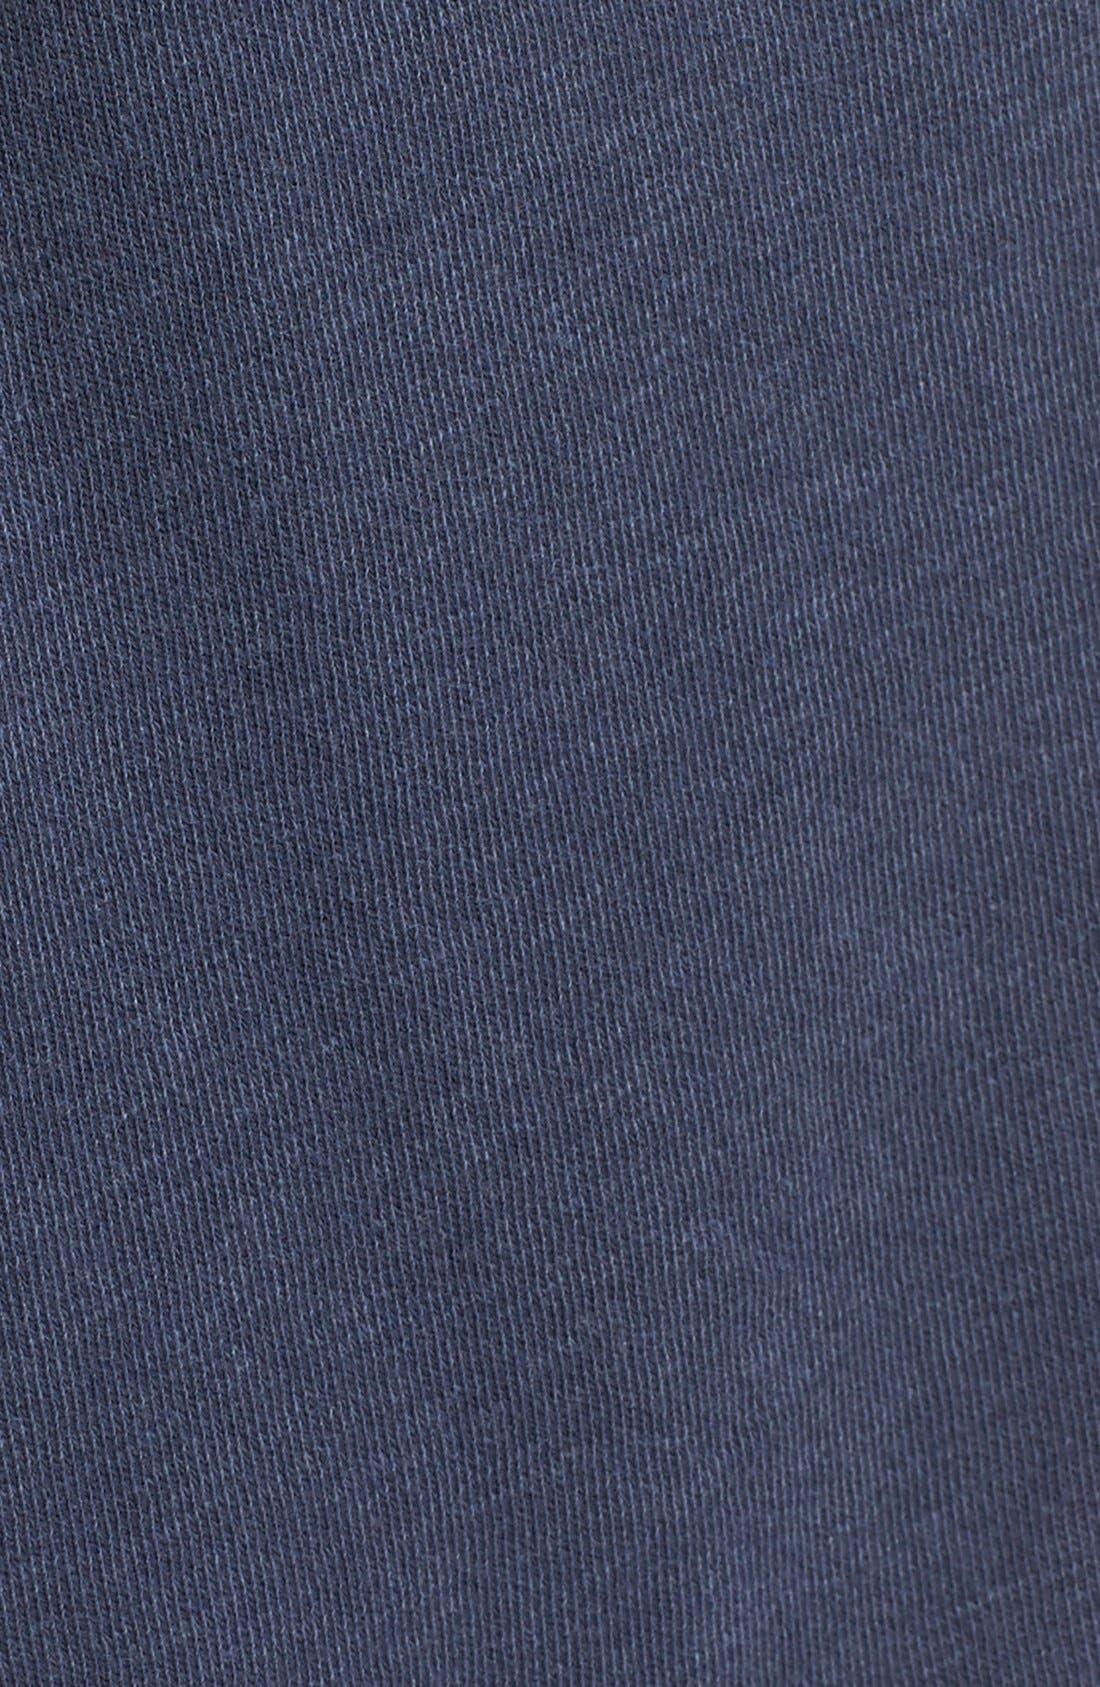 'Classic' Sweatpants,                             Alternate thumbnail 43, color,